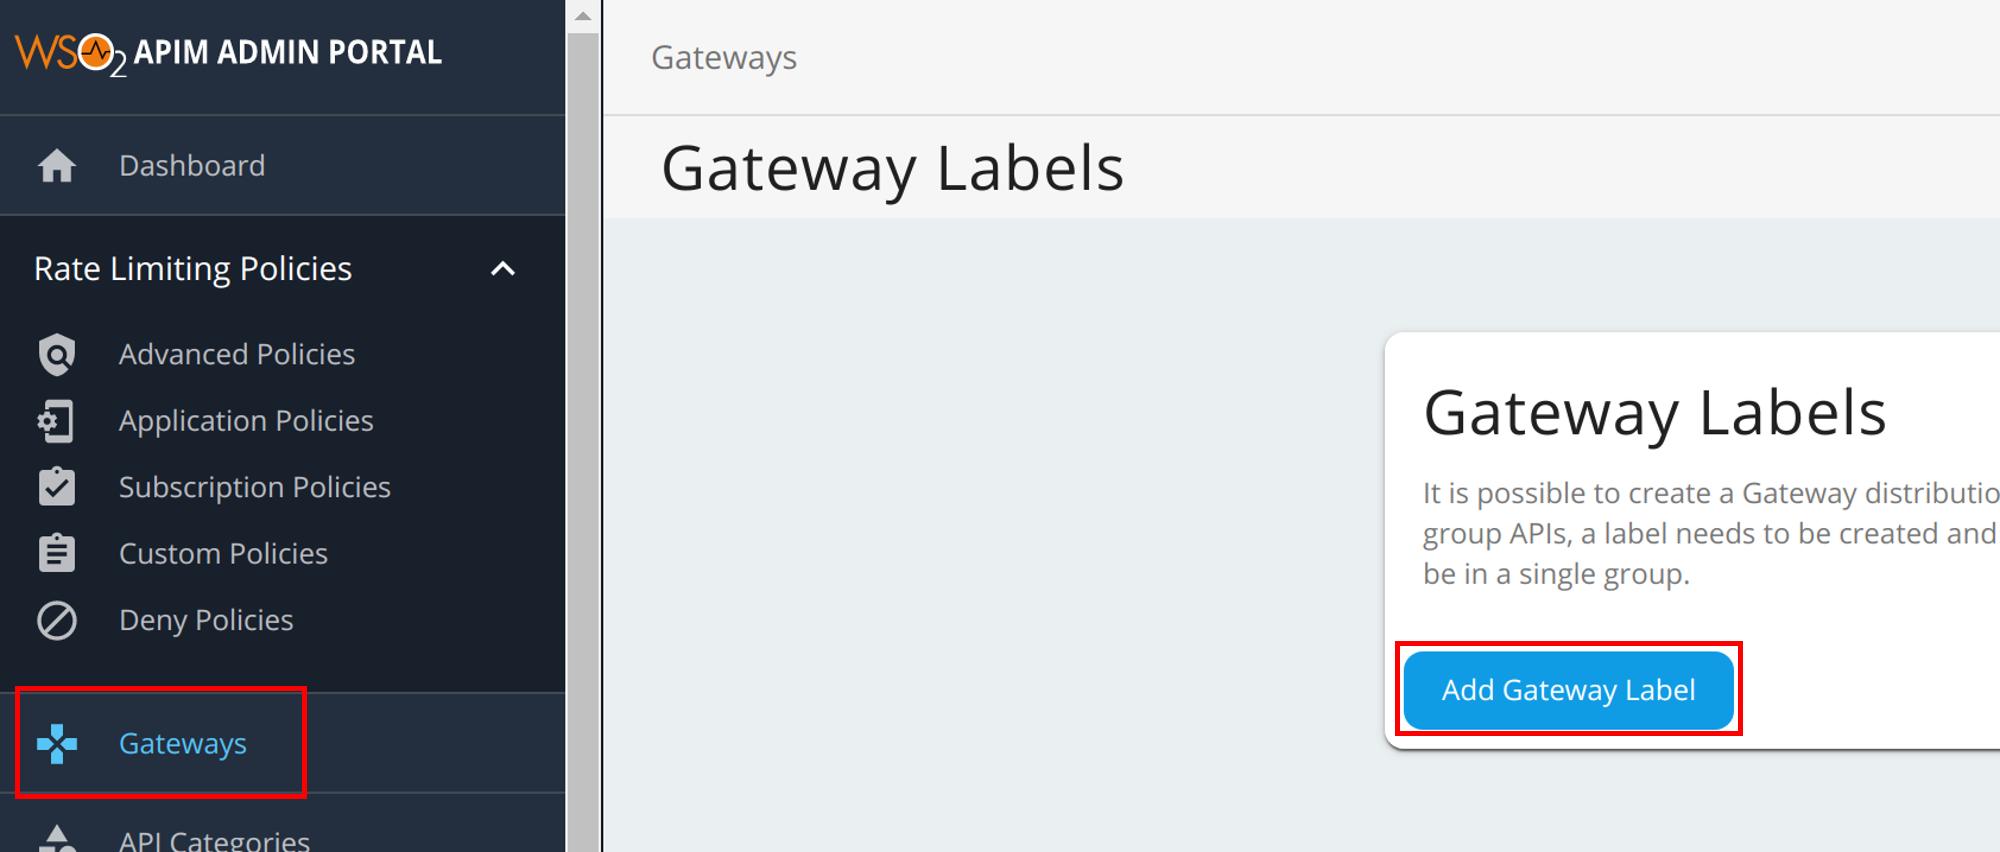 Menu to add Microgateway label